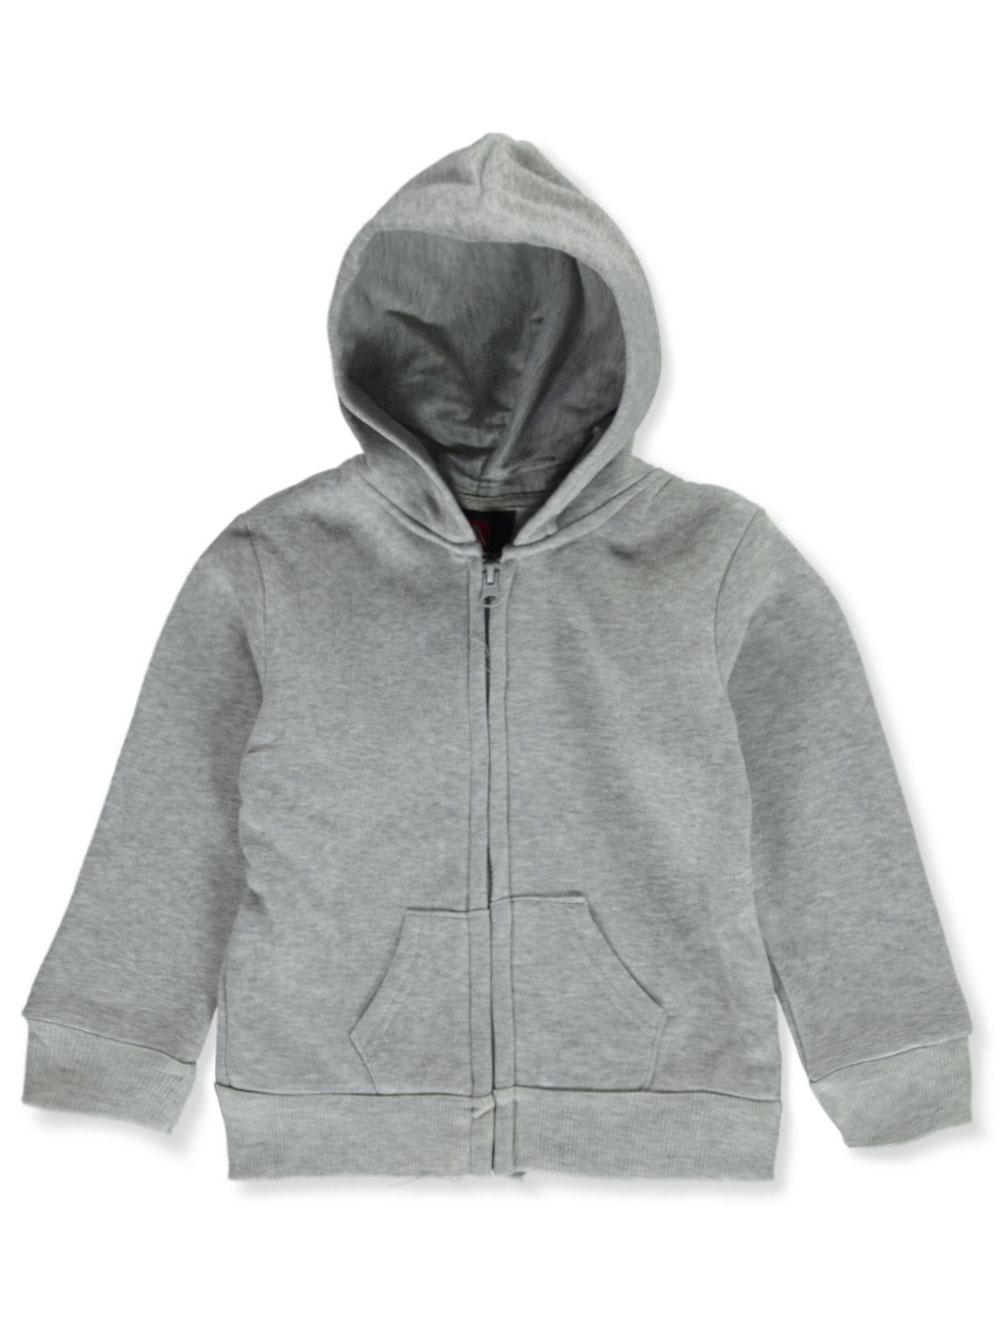 Boys' Fleece Zip Up Hoodie by Roadblock in black, charcoal gray, heather gray and navy